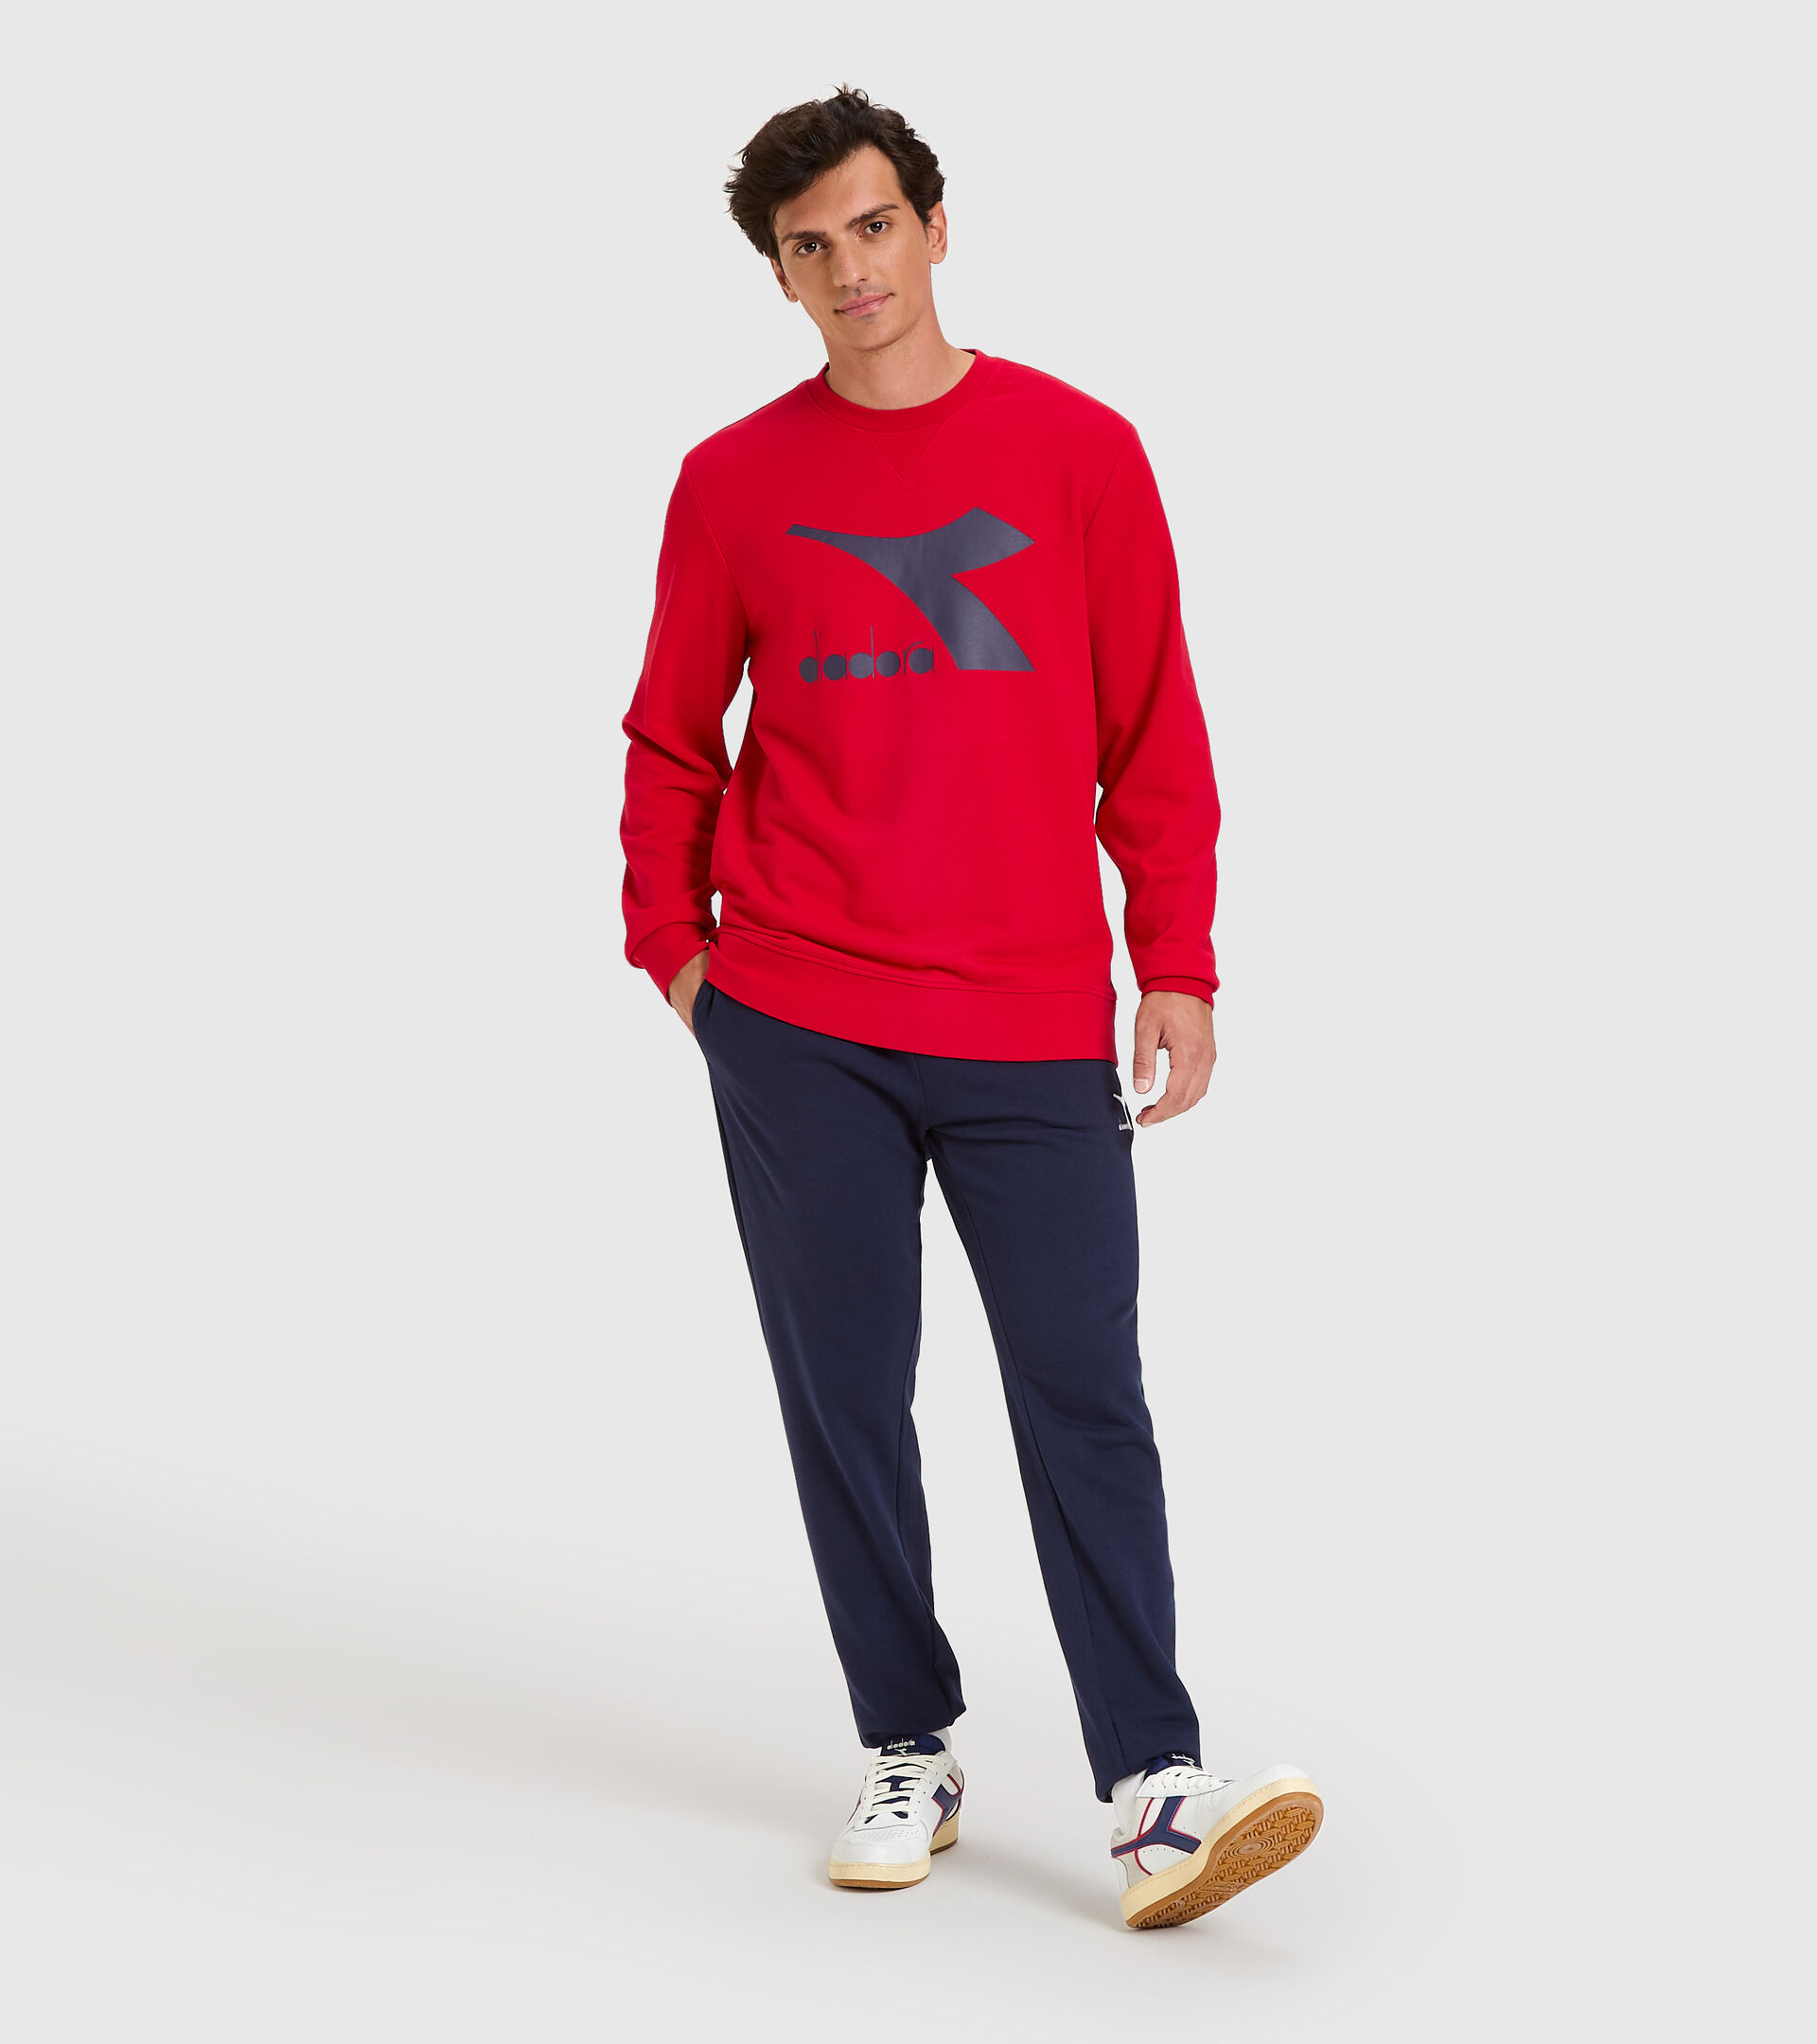 Sweater mit Rundhalsausschnitt - Herren SWEATSHIRT CREW LOGO CHROMIA TANGOROT - Diadora